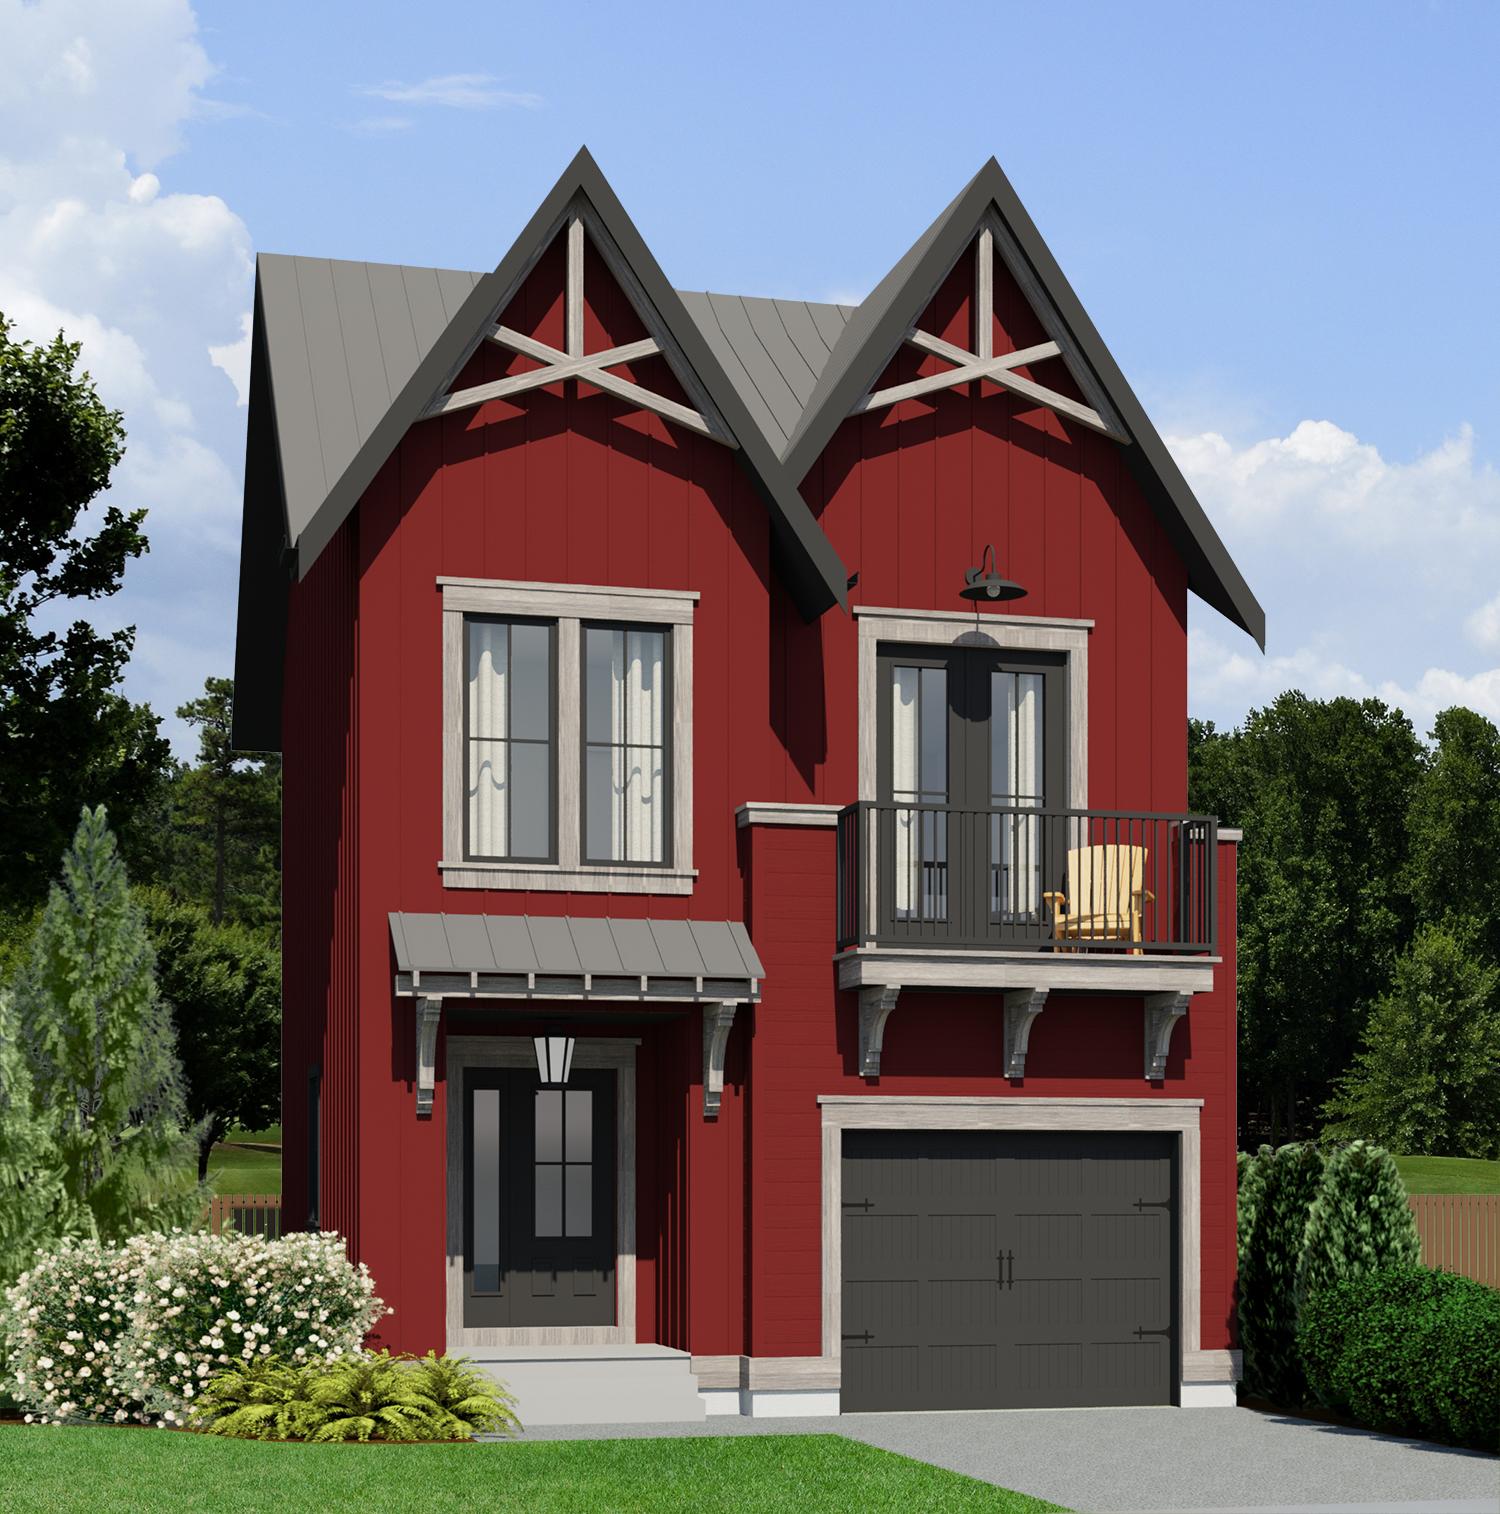 Tiny Home Designs: Modern Farmhouse Durum-728